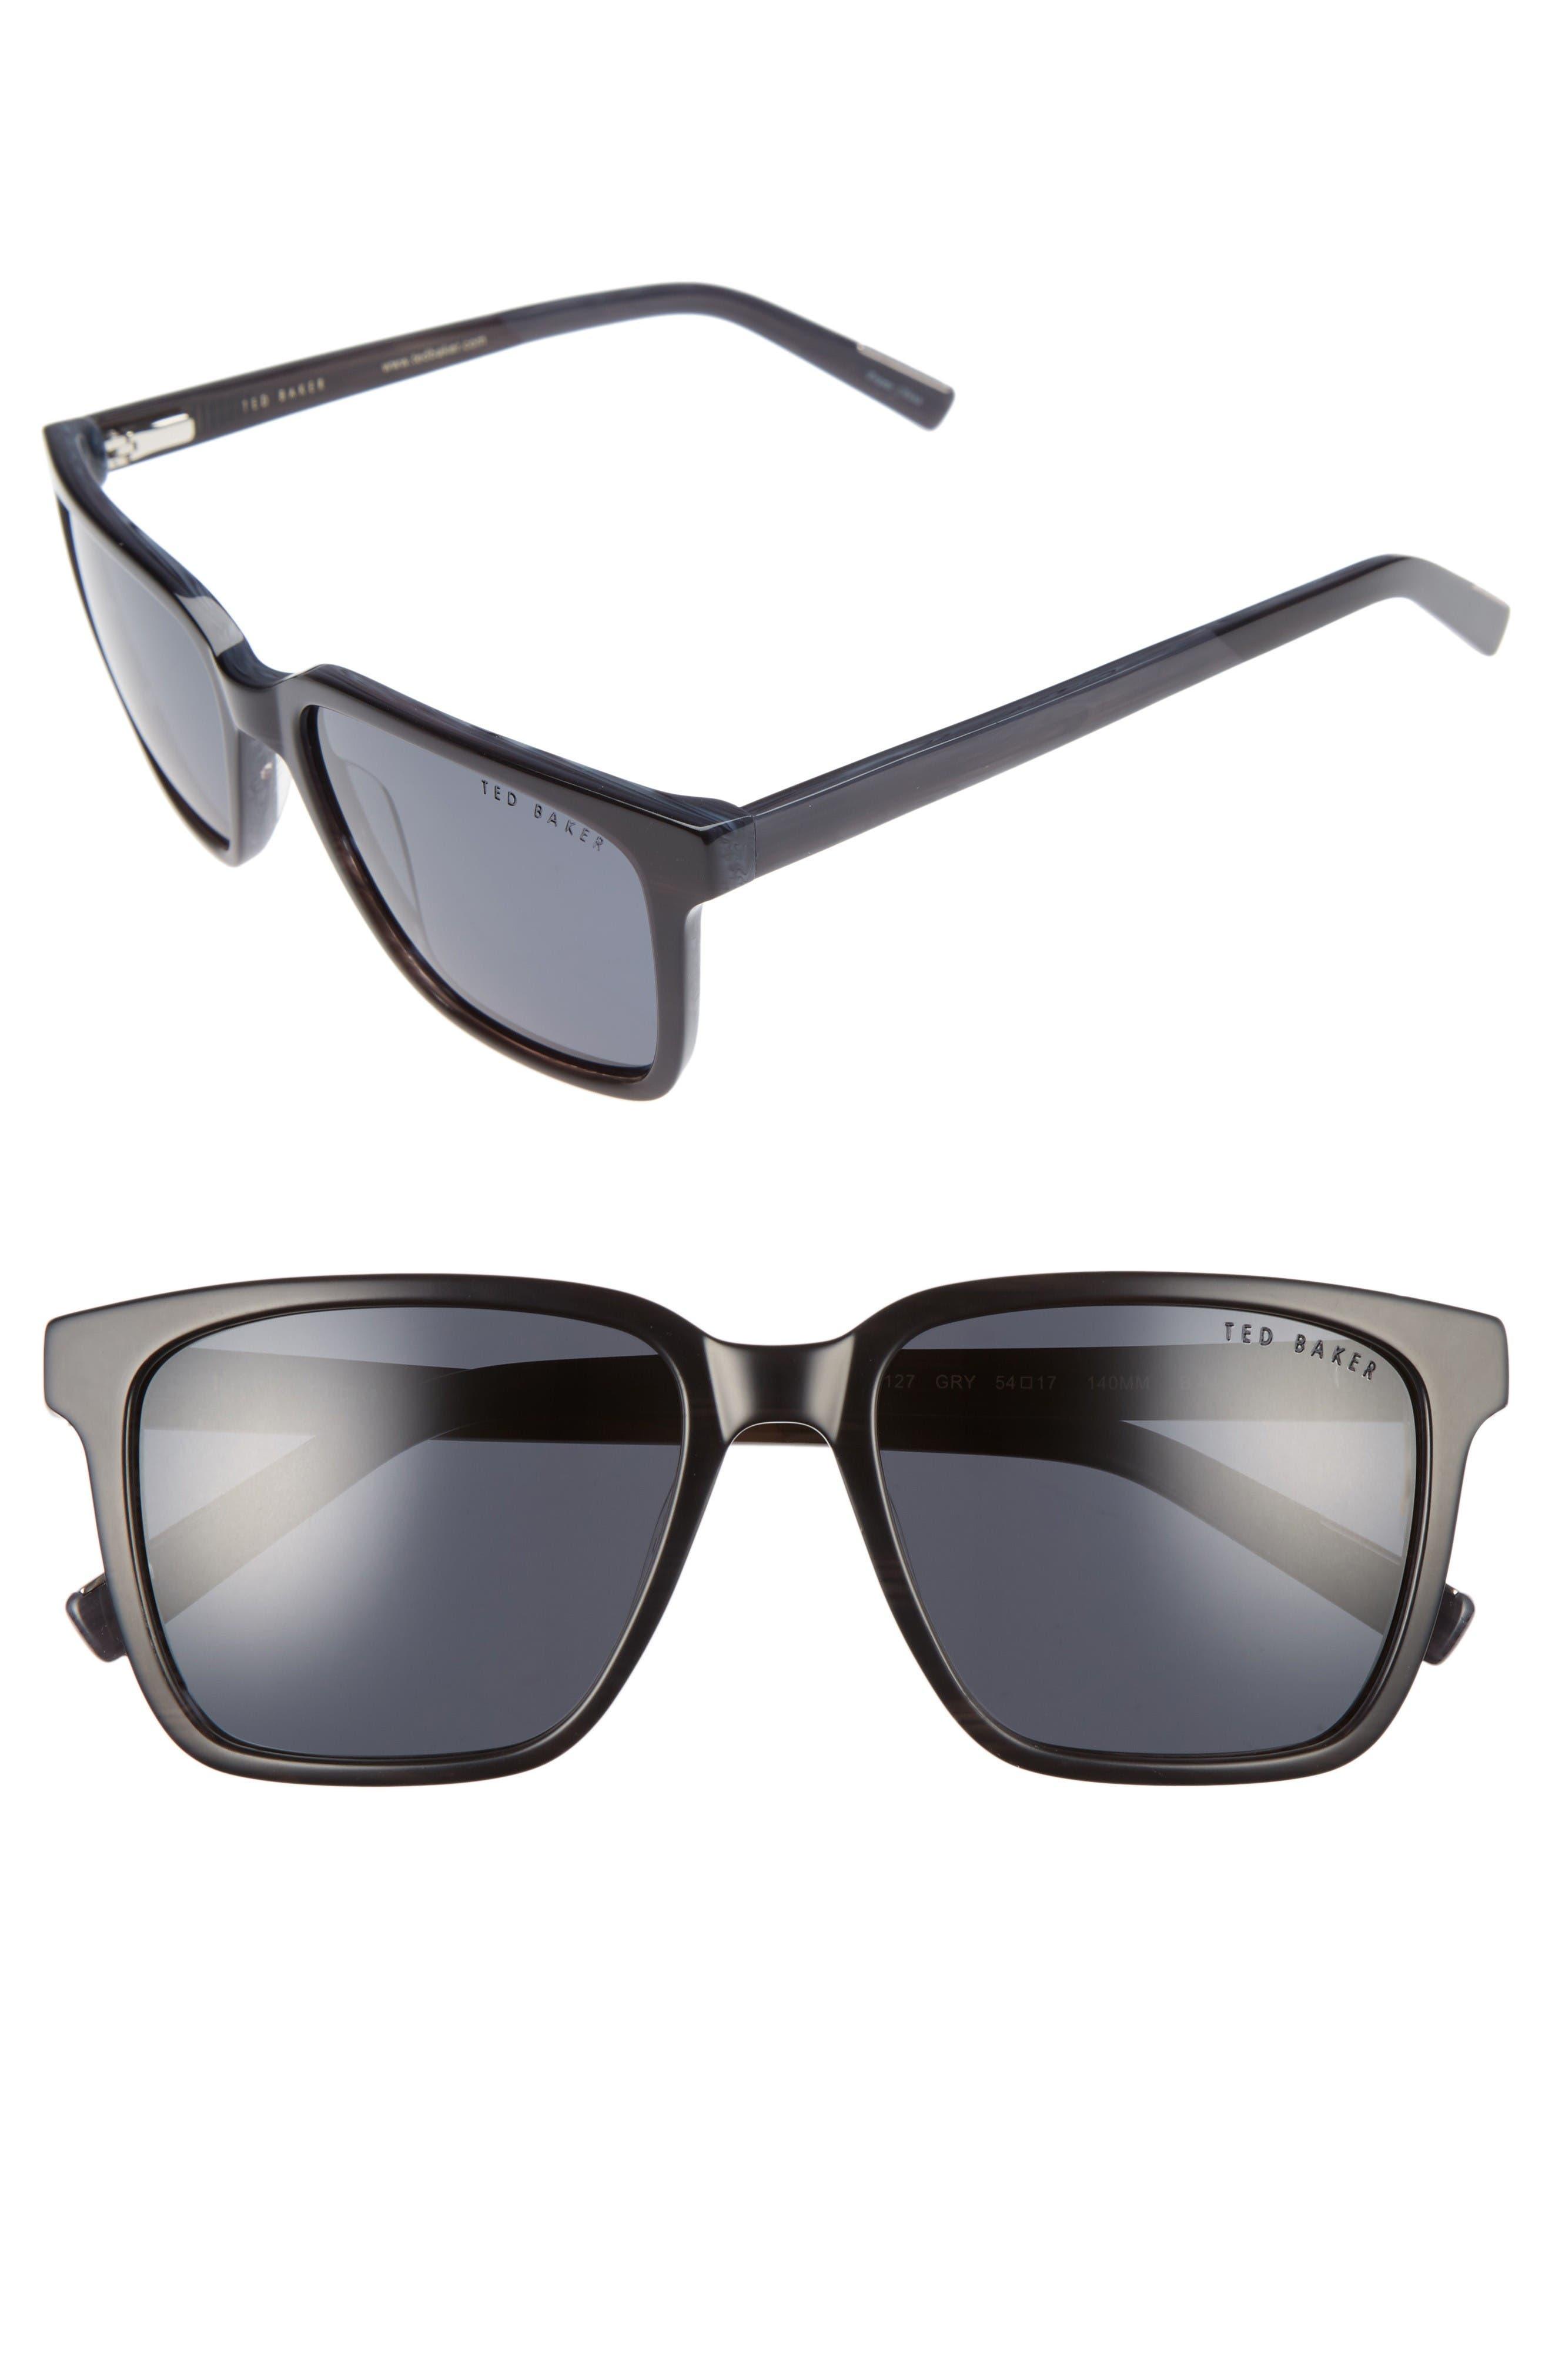 54mm Polarized Sunglasses,                             Main thumbnail 1, color,                             Grey